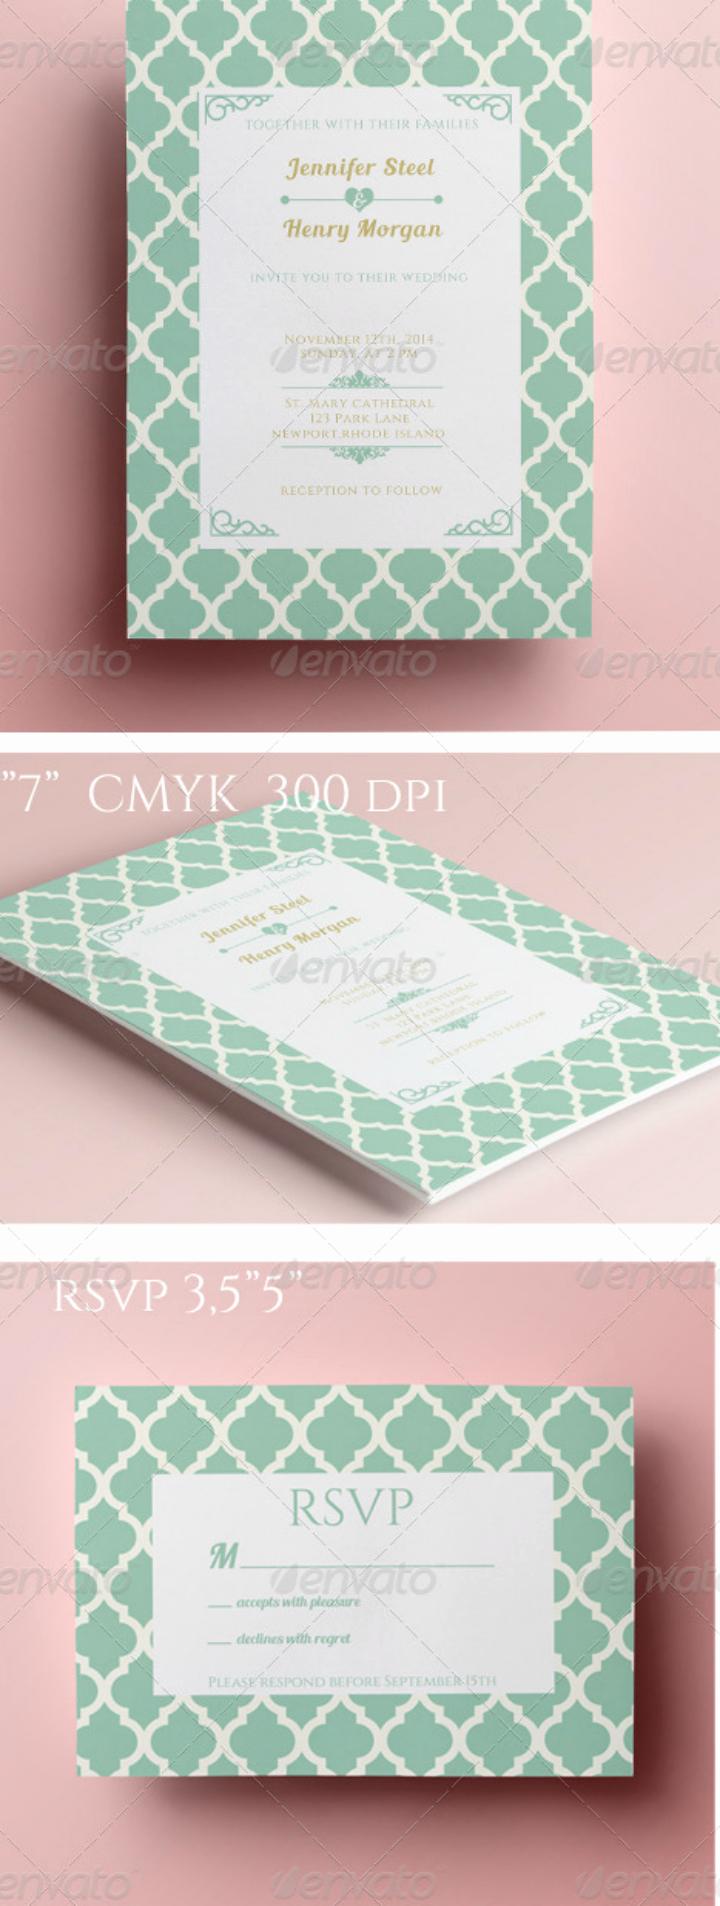 13 Wedding Rsvp Cards